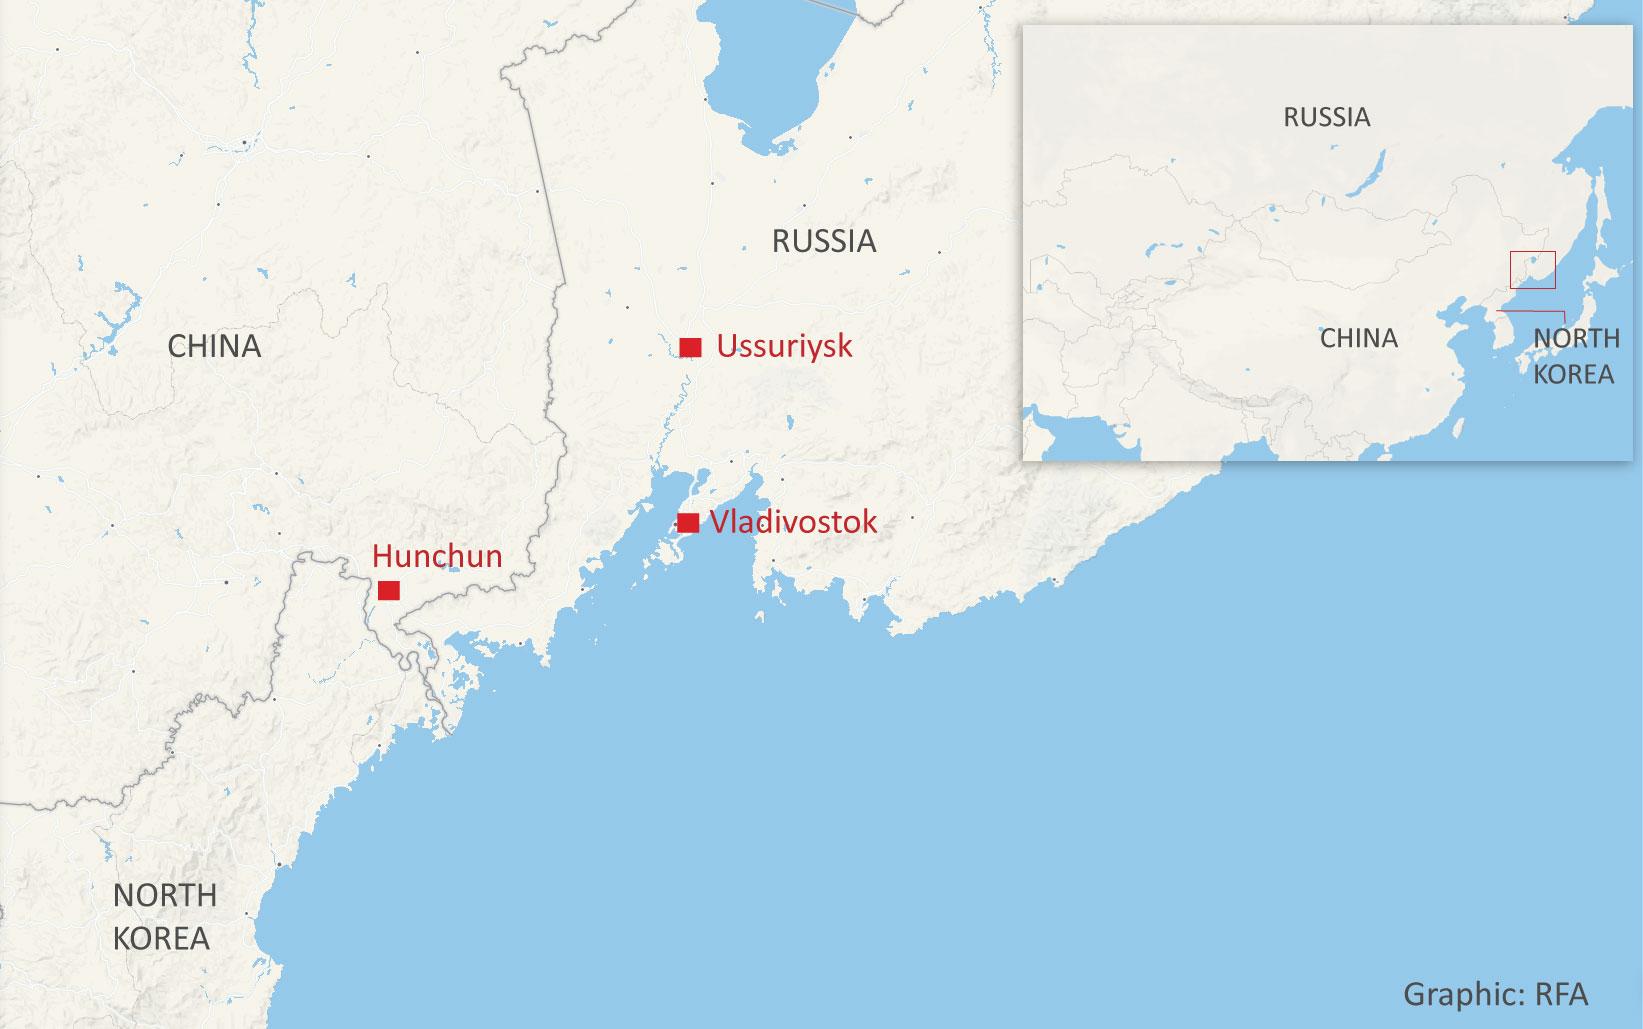 vladivostok-ussuriysk-hunchun-nk-map